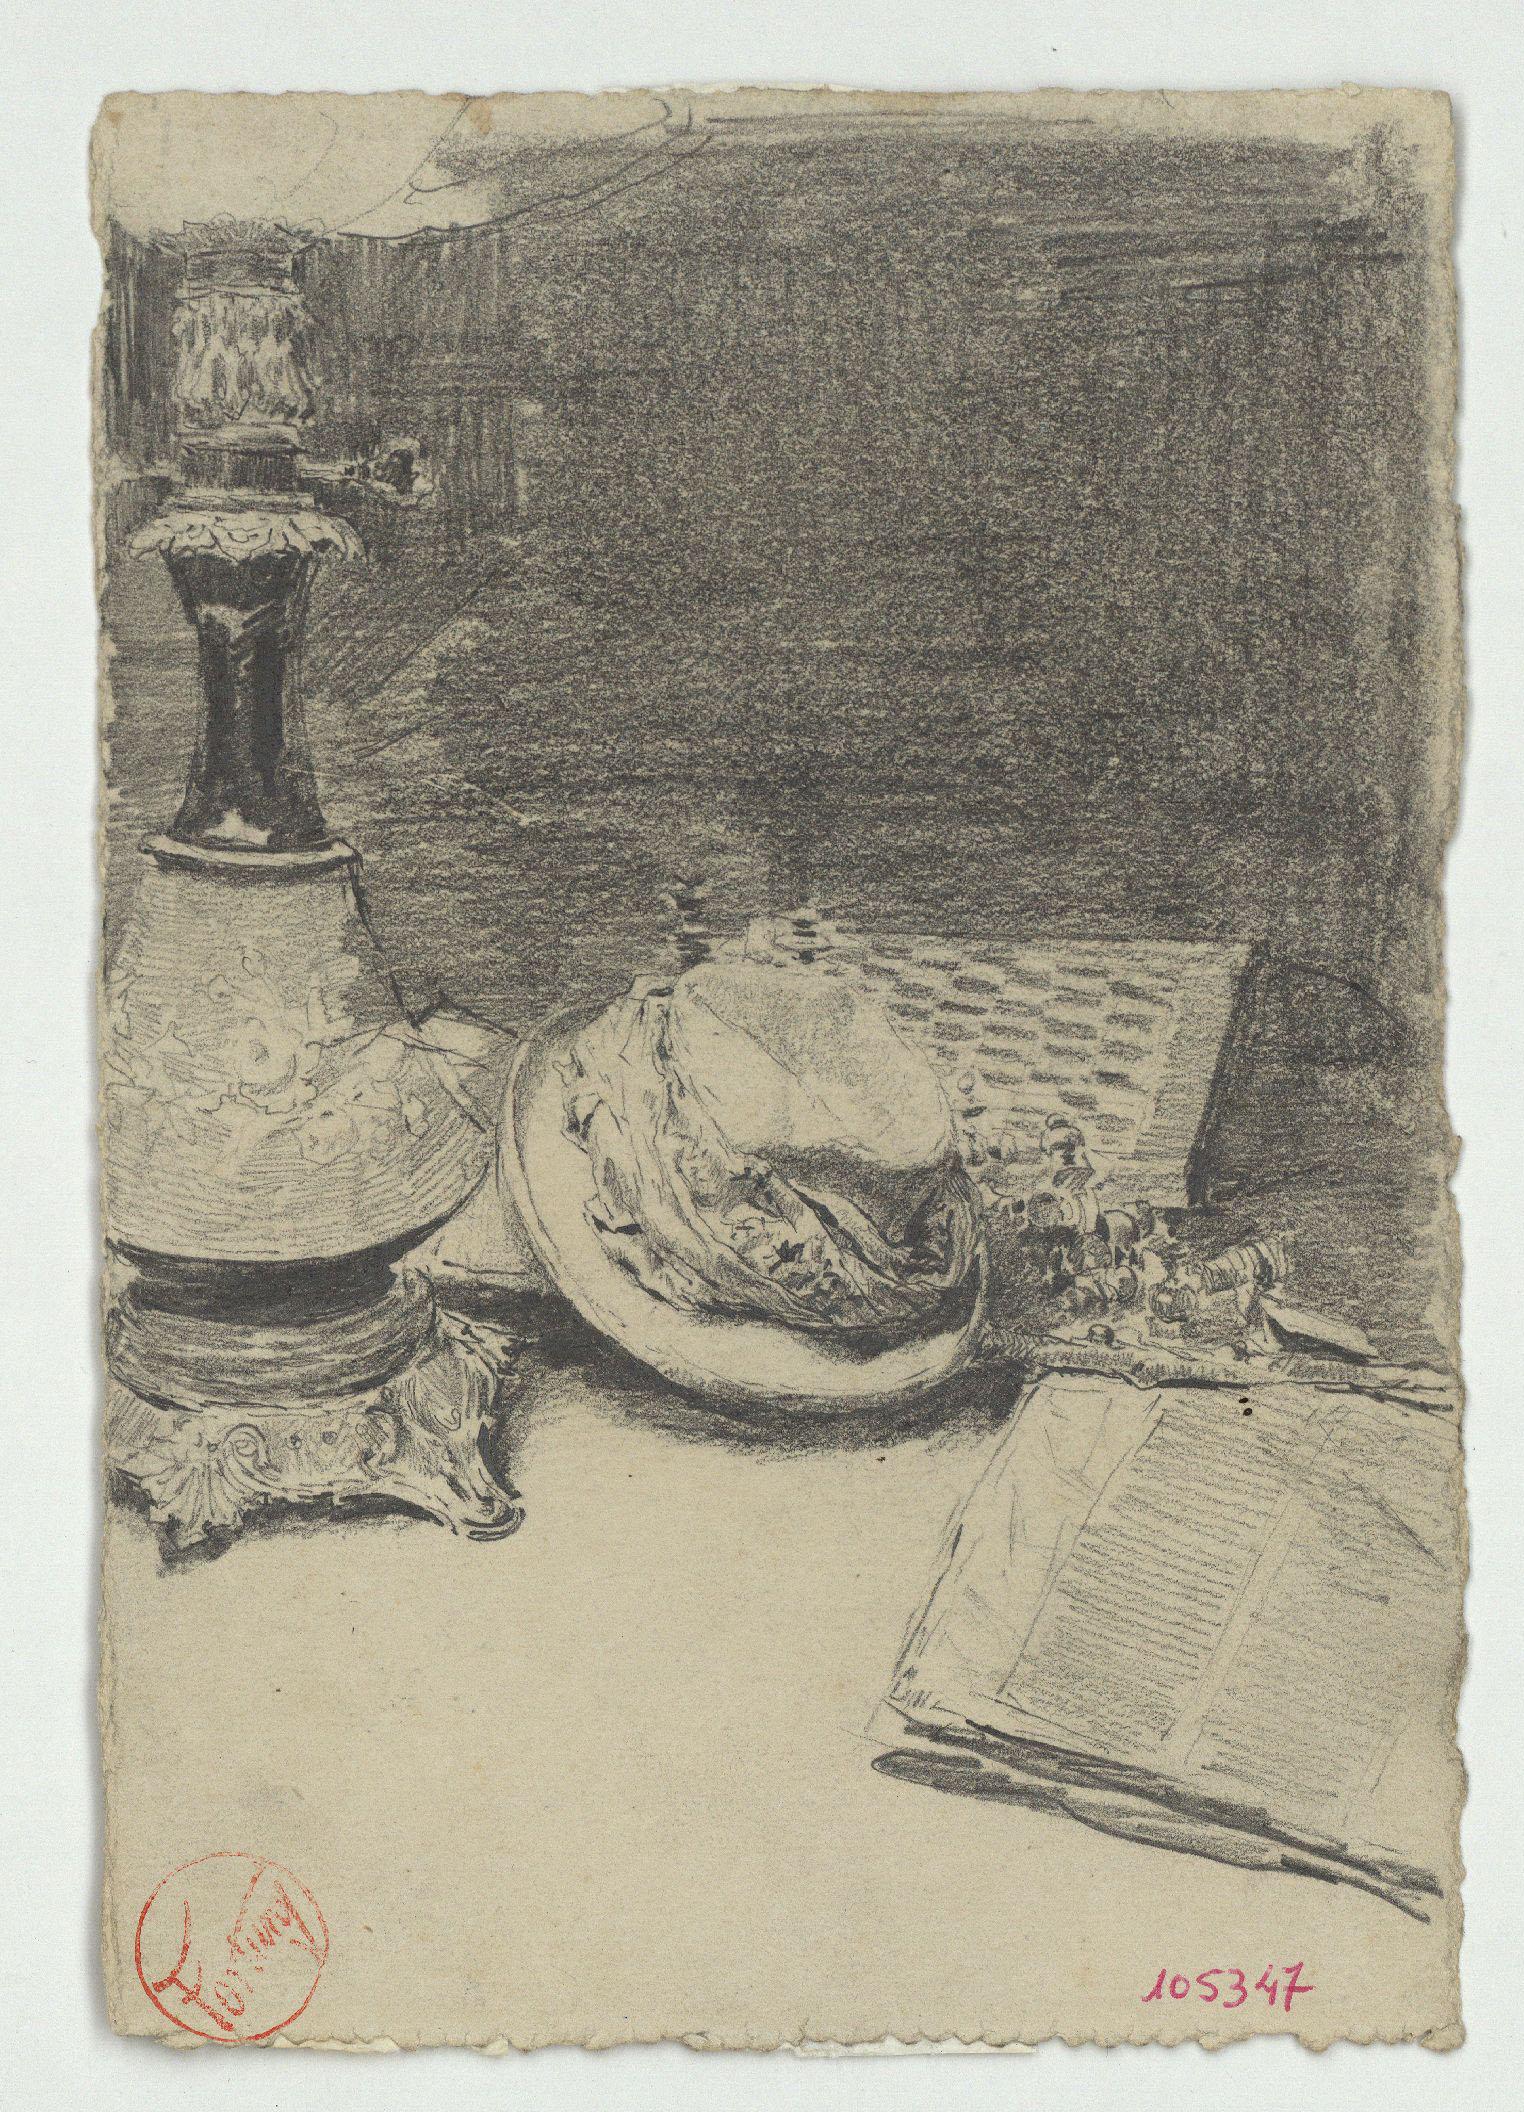 Marià Fortuny - Still life with hat - Circa 1863-1866